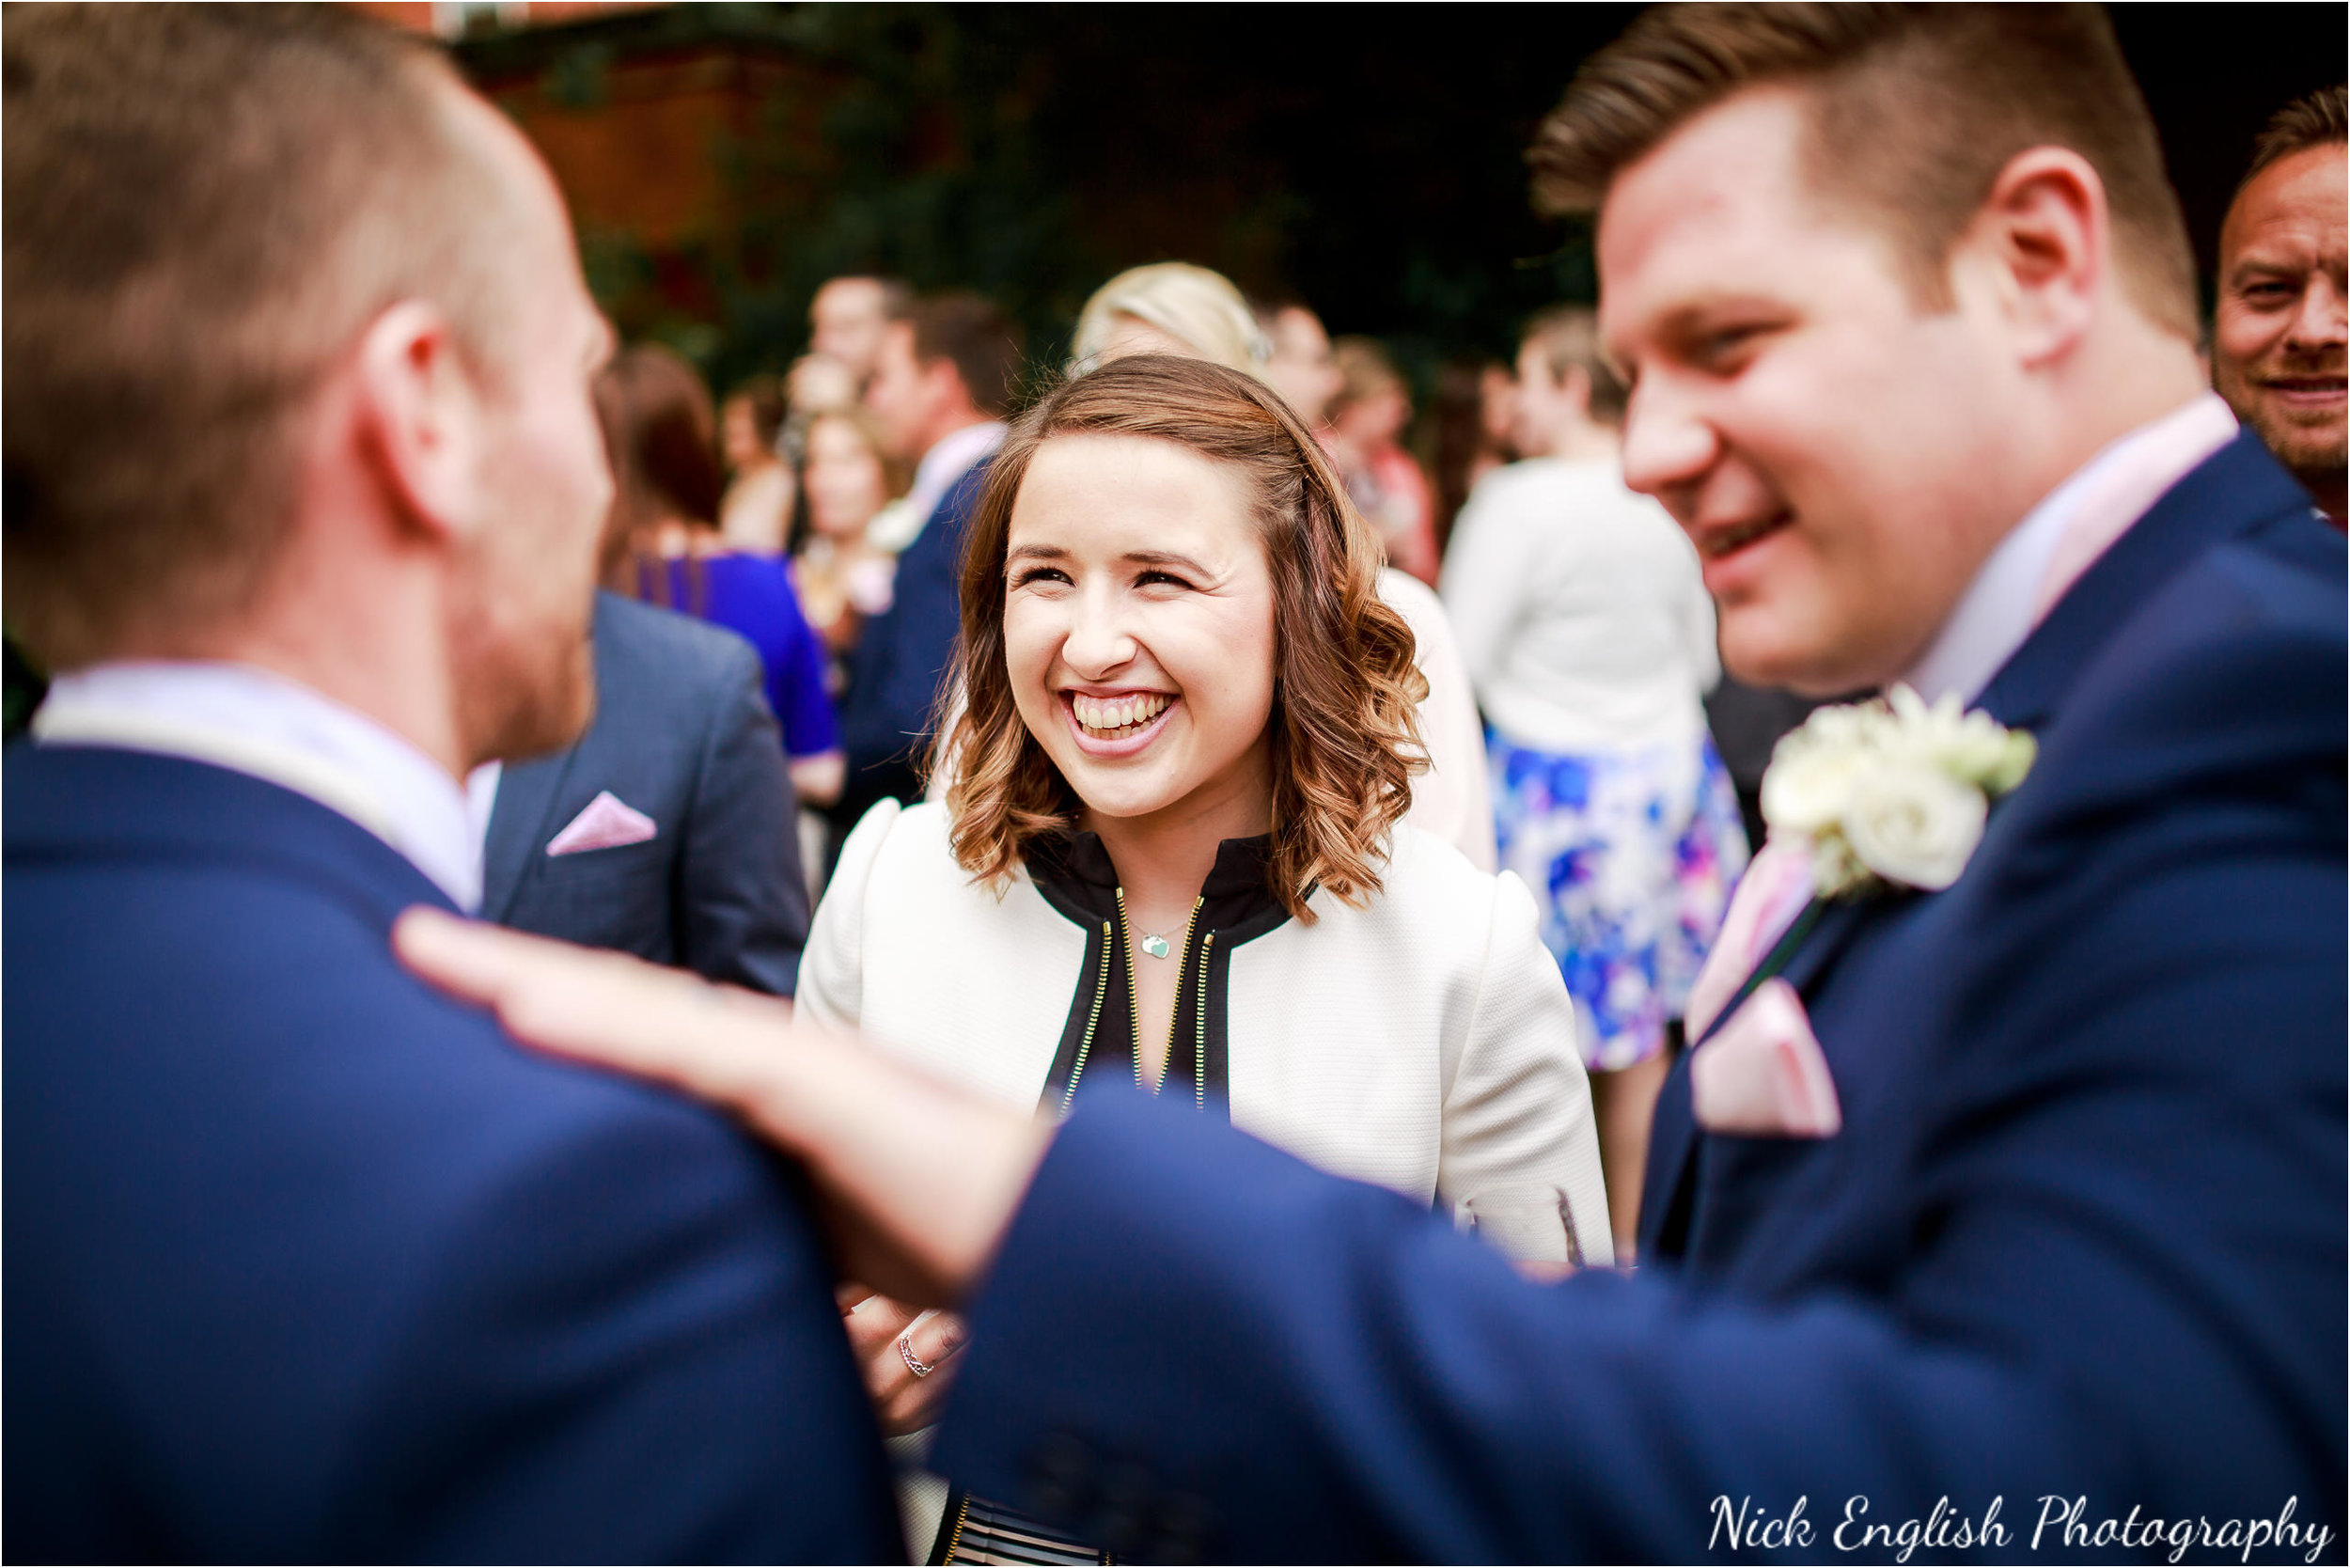 Emily David Wedding Photographs at Barton Grange Preston by Nick English Photography 108jpg.jpeg